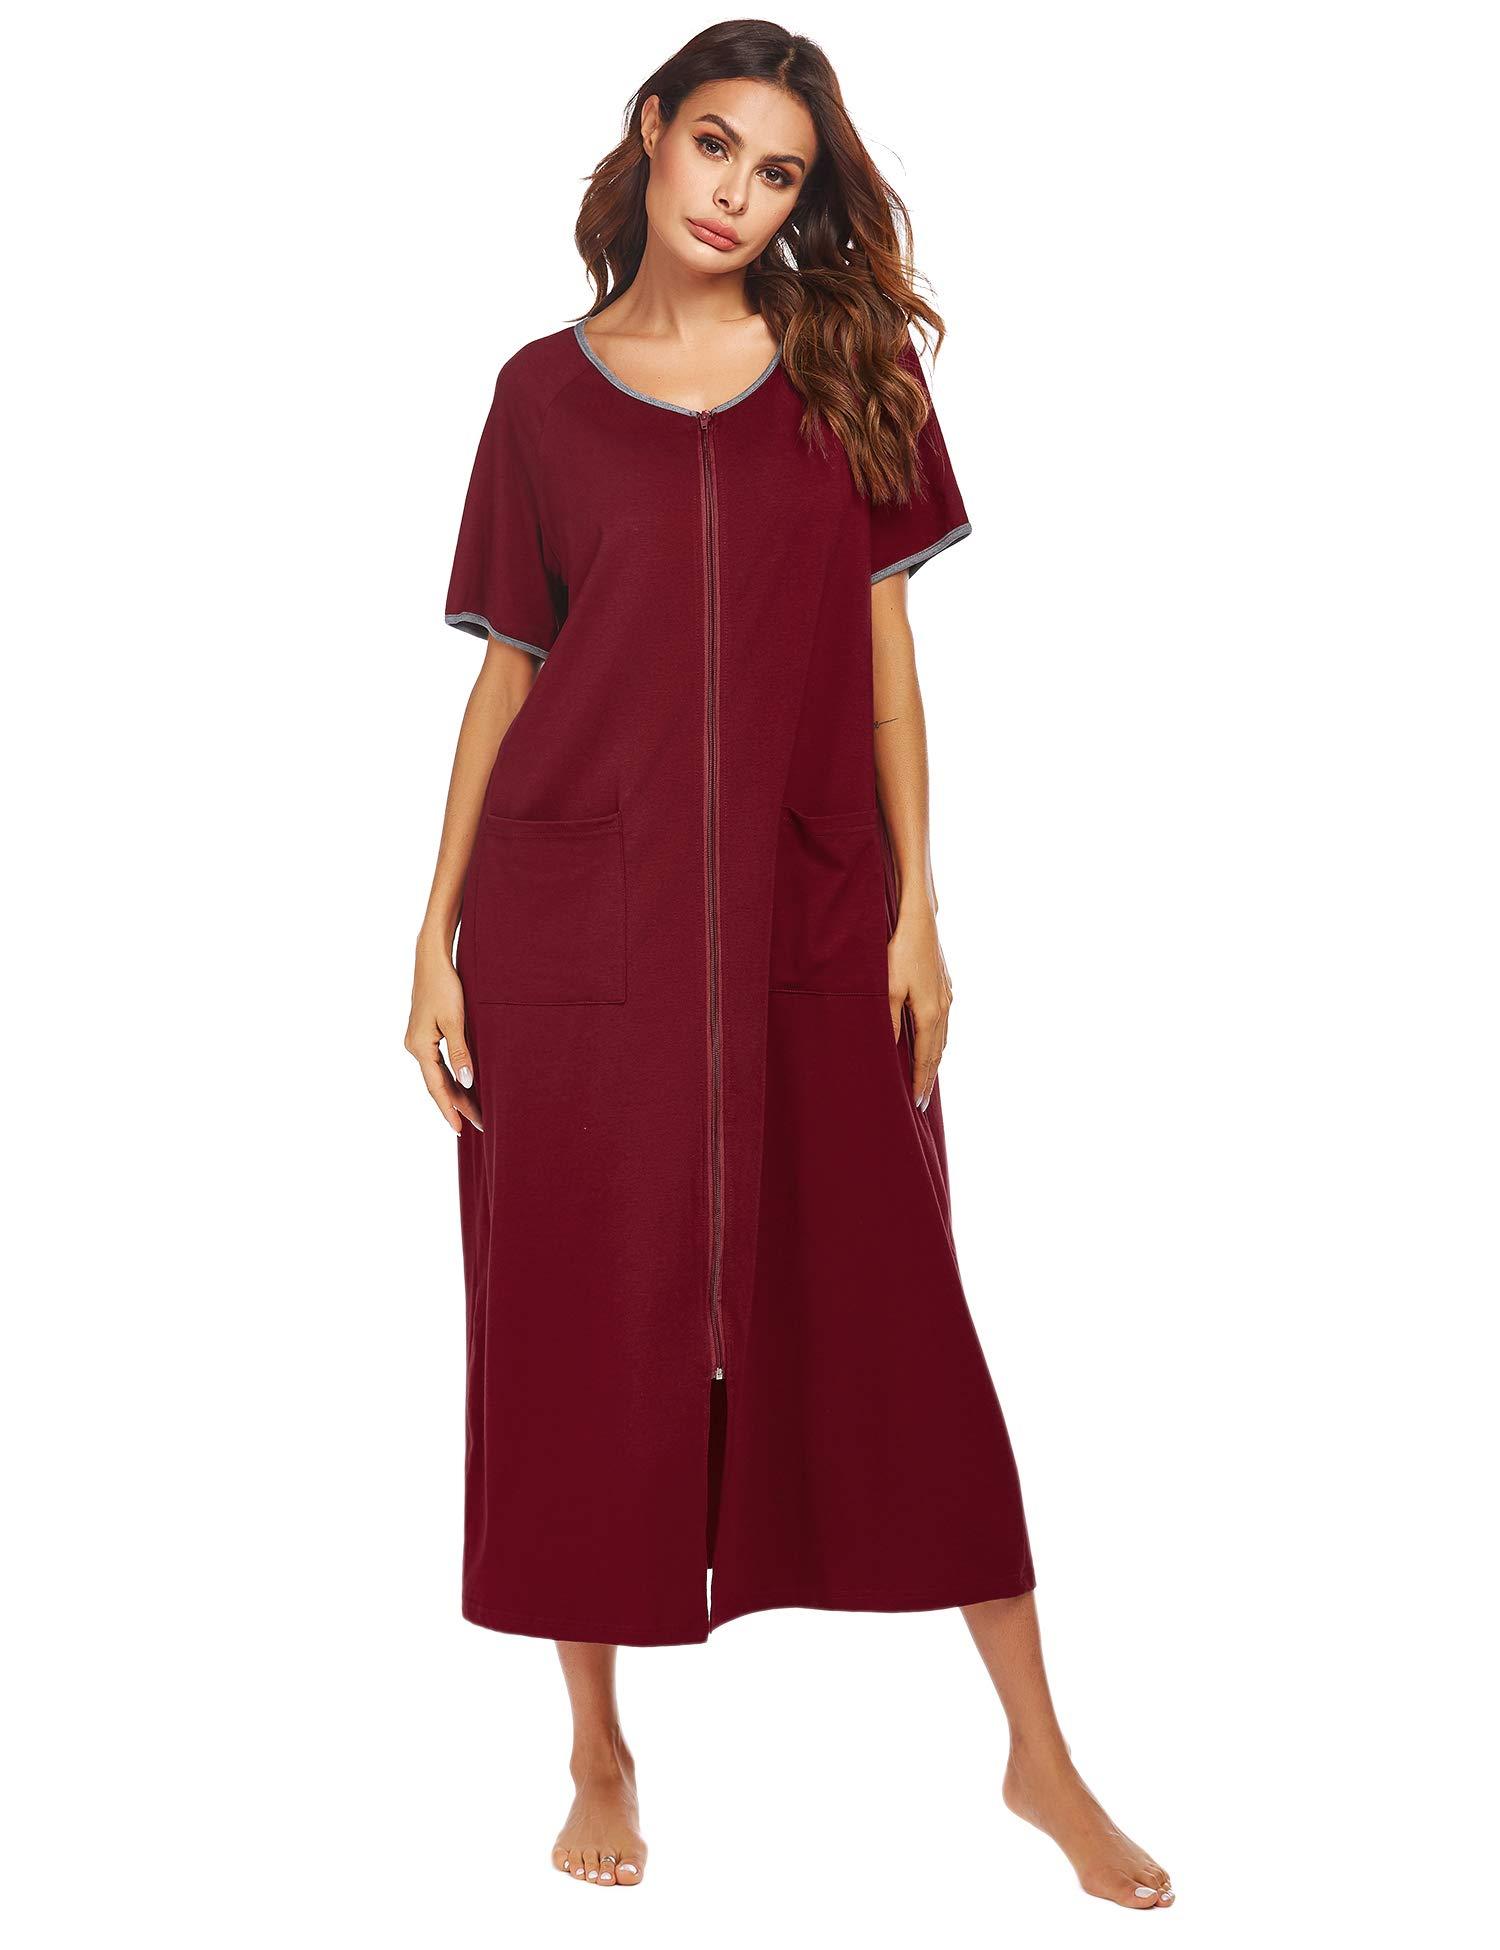 Ekouaer Women Robes Zipper Front Short Sleeve Full Length Housecoat with Pockets Loungewear